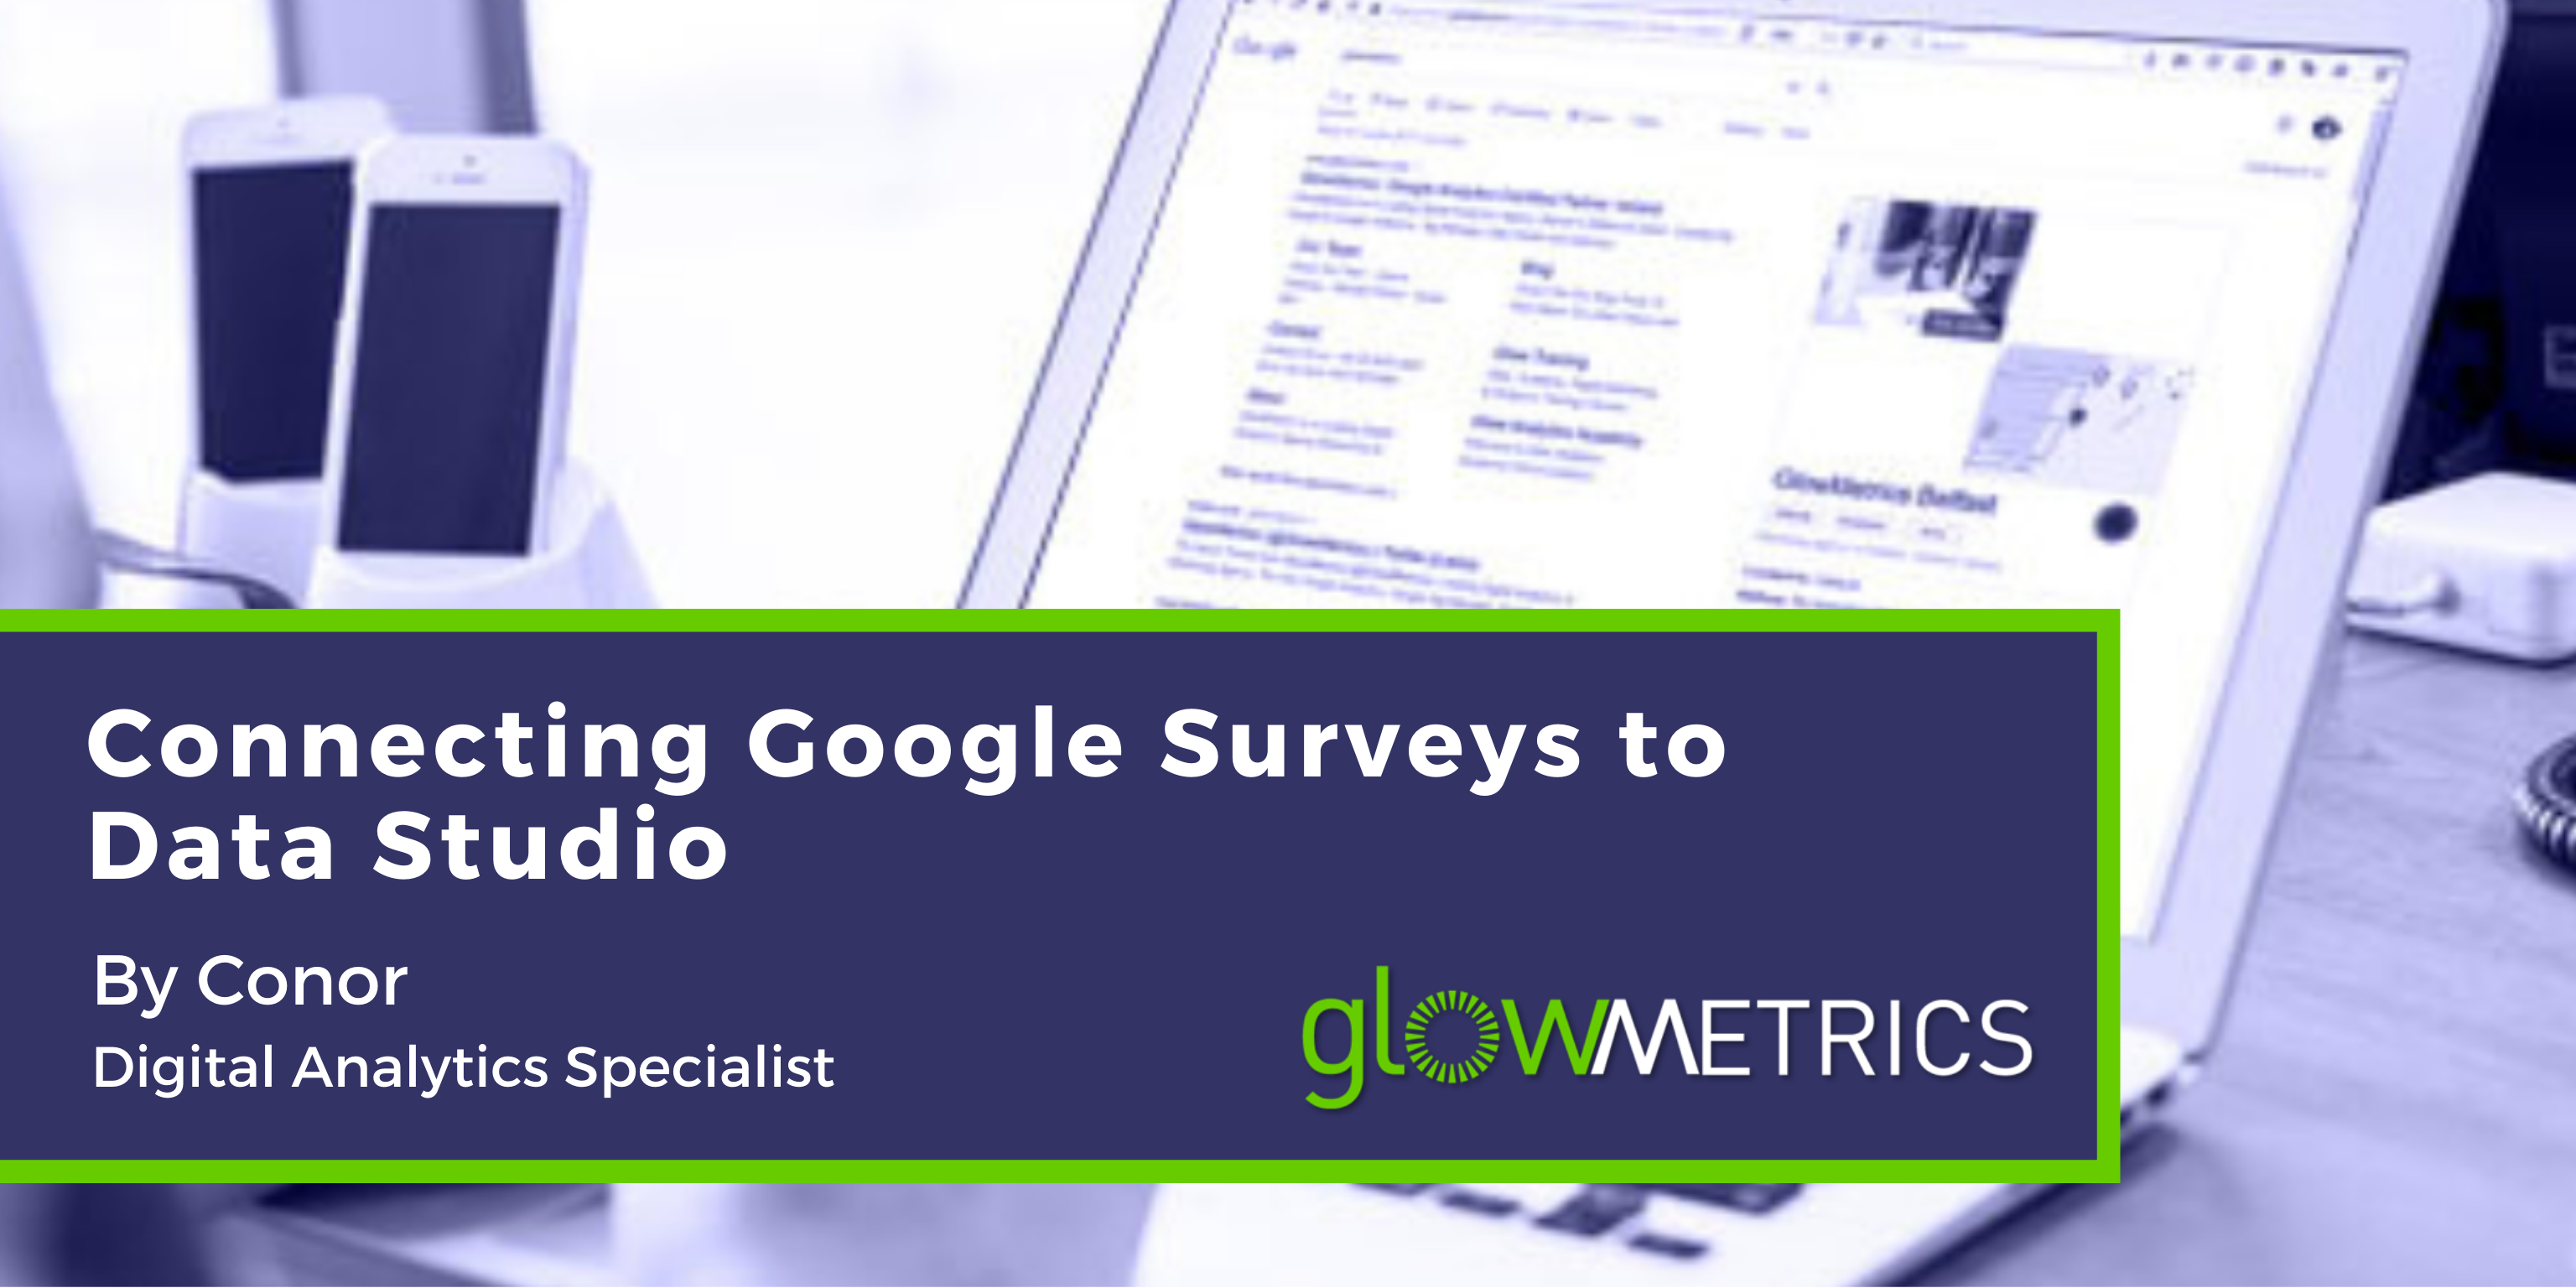 Connecting-Google-Surveys-to-Data-Studio